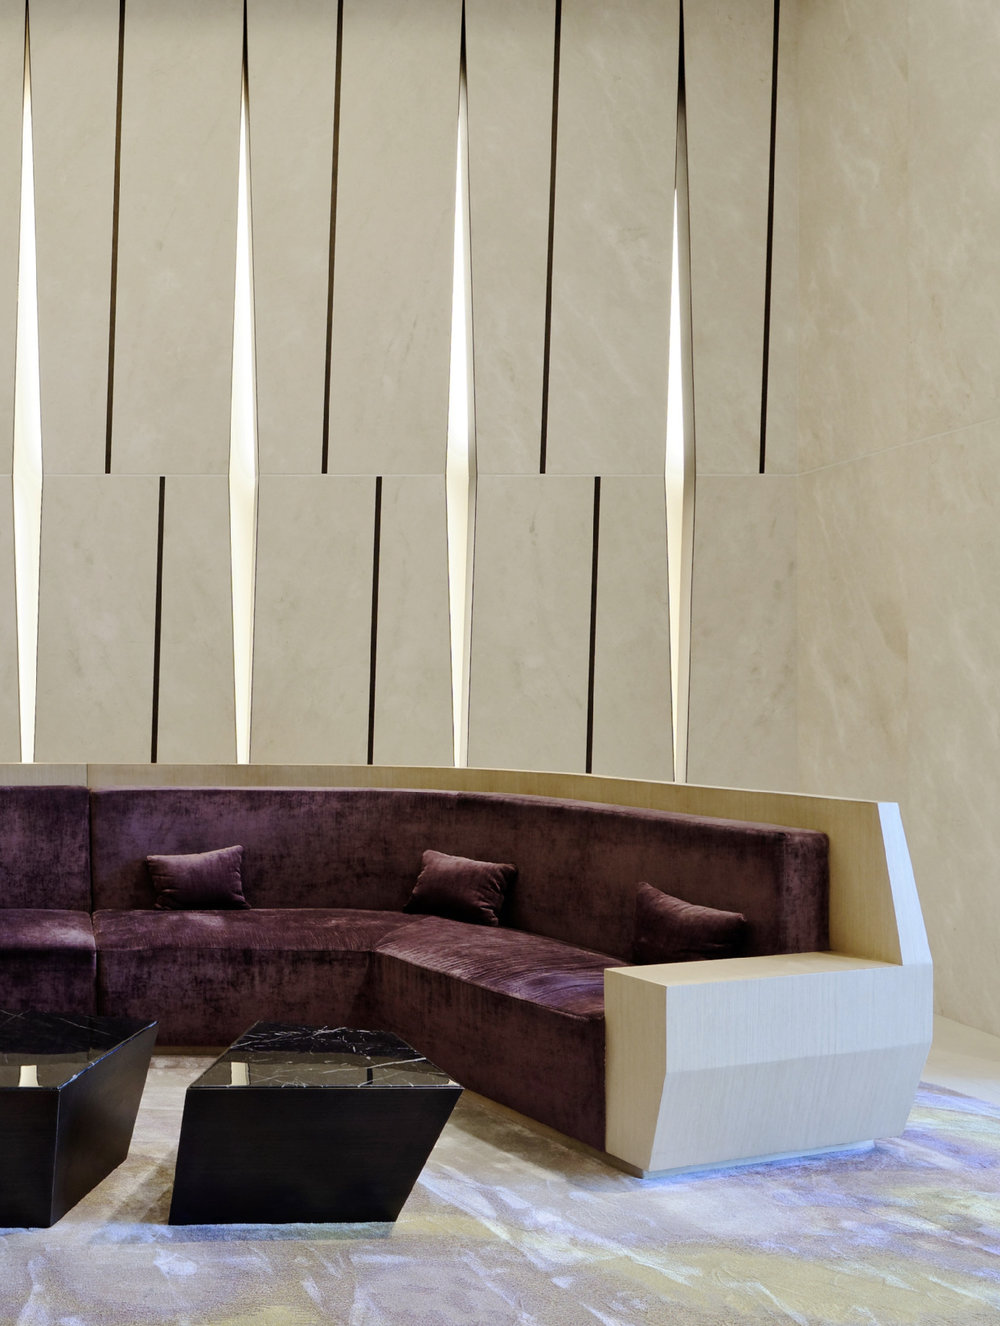 LA_couch .jpg